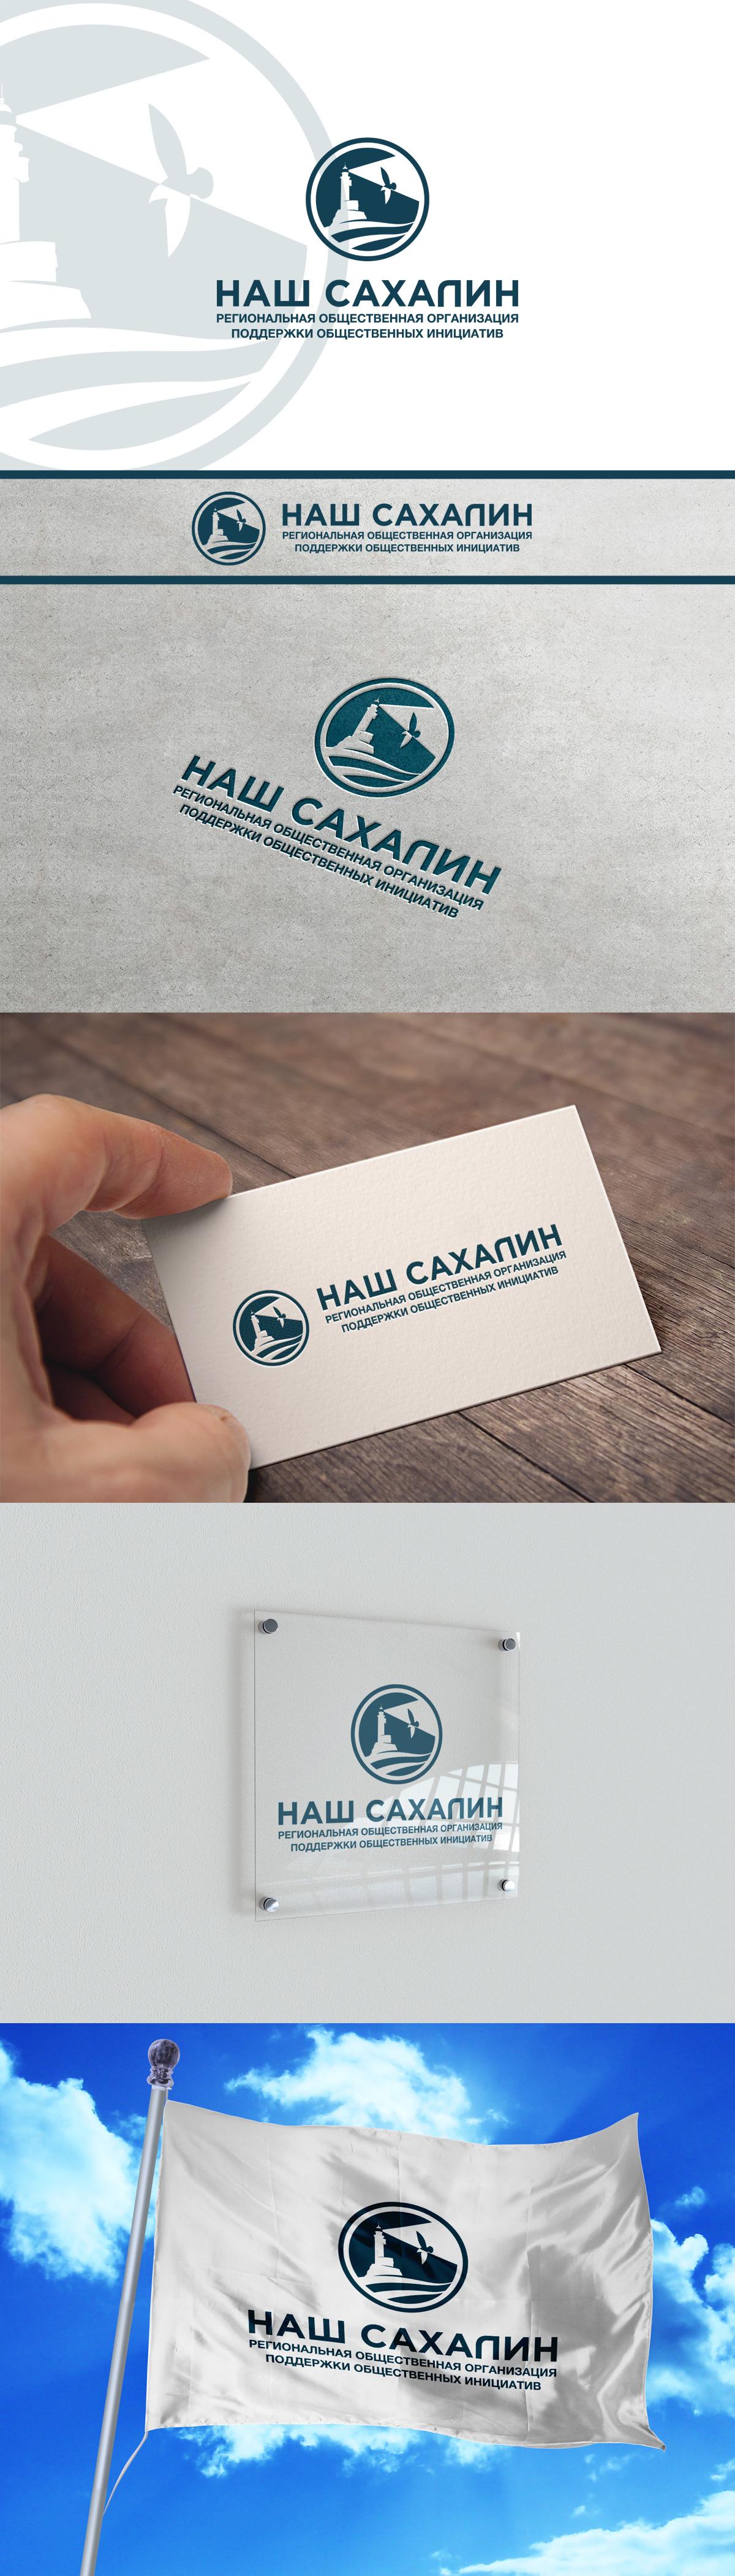 "Логотип для некоммерческой организации ""Наш Сахалин"" фото f_7495a803ec31e9d9.jpg"